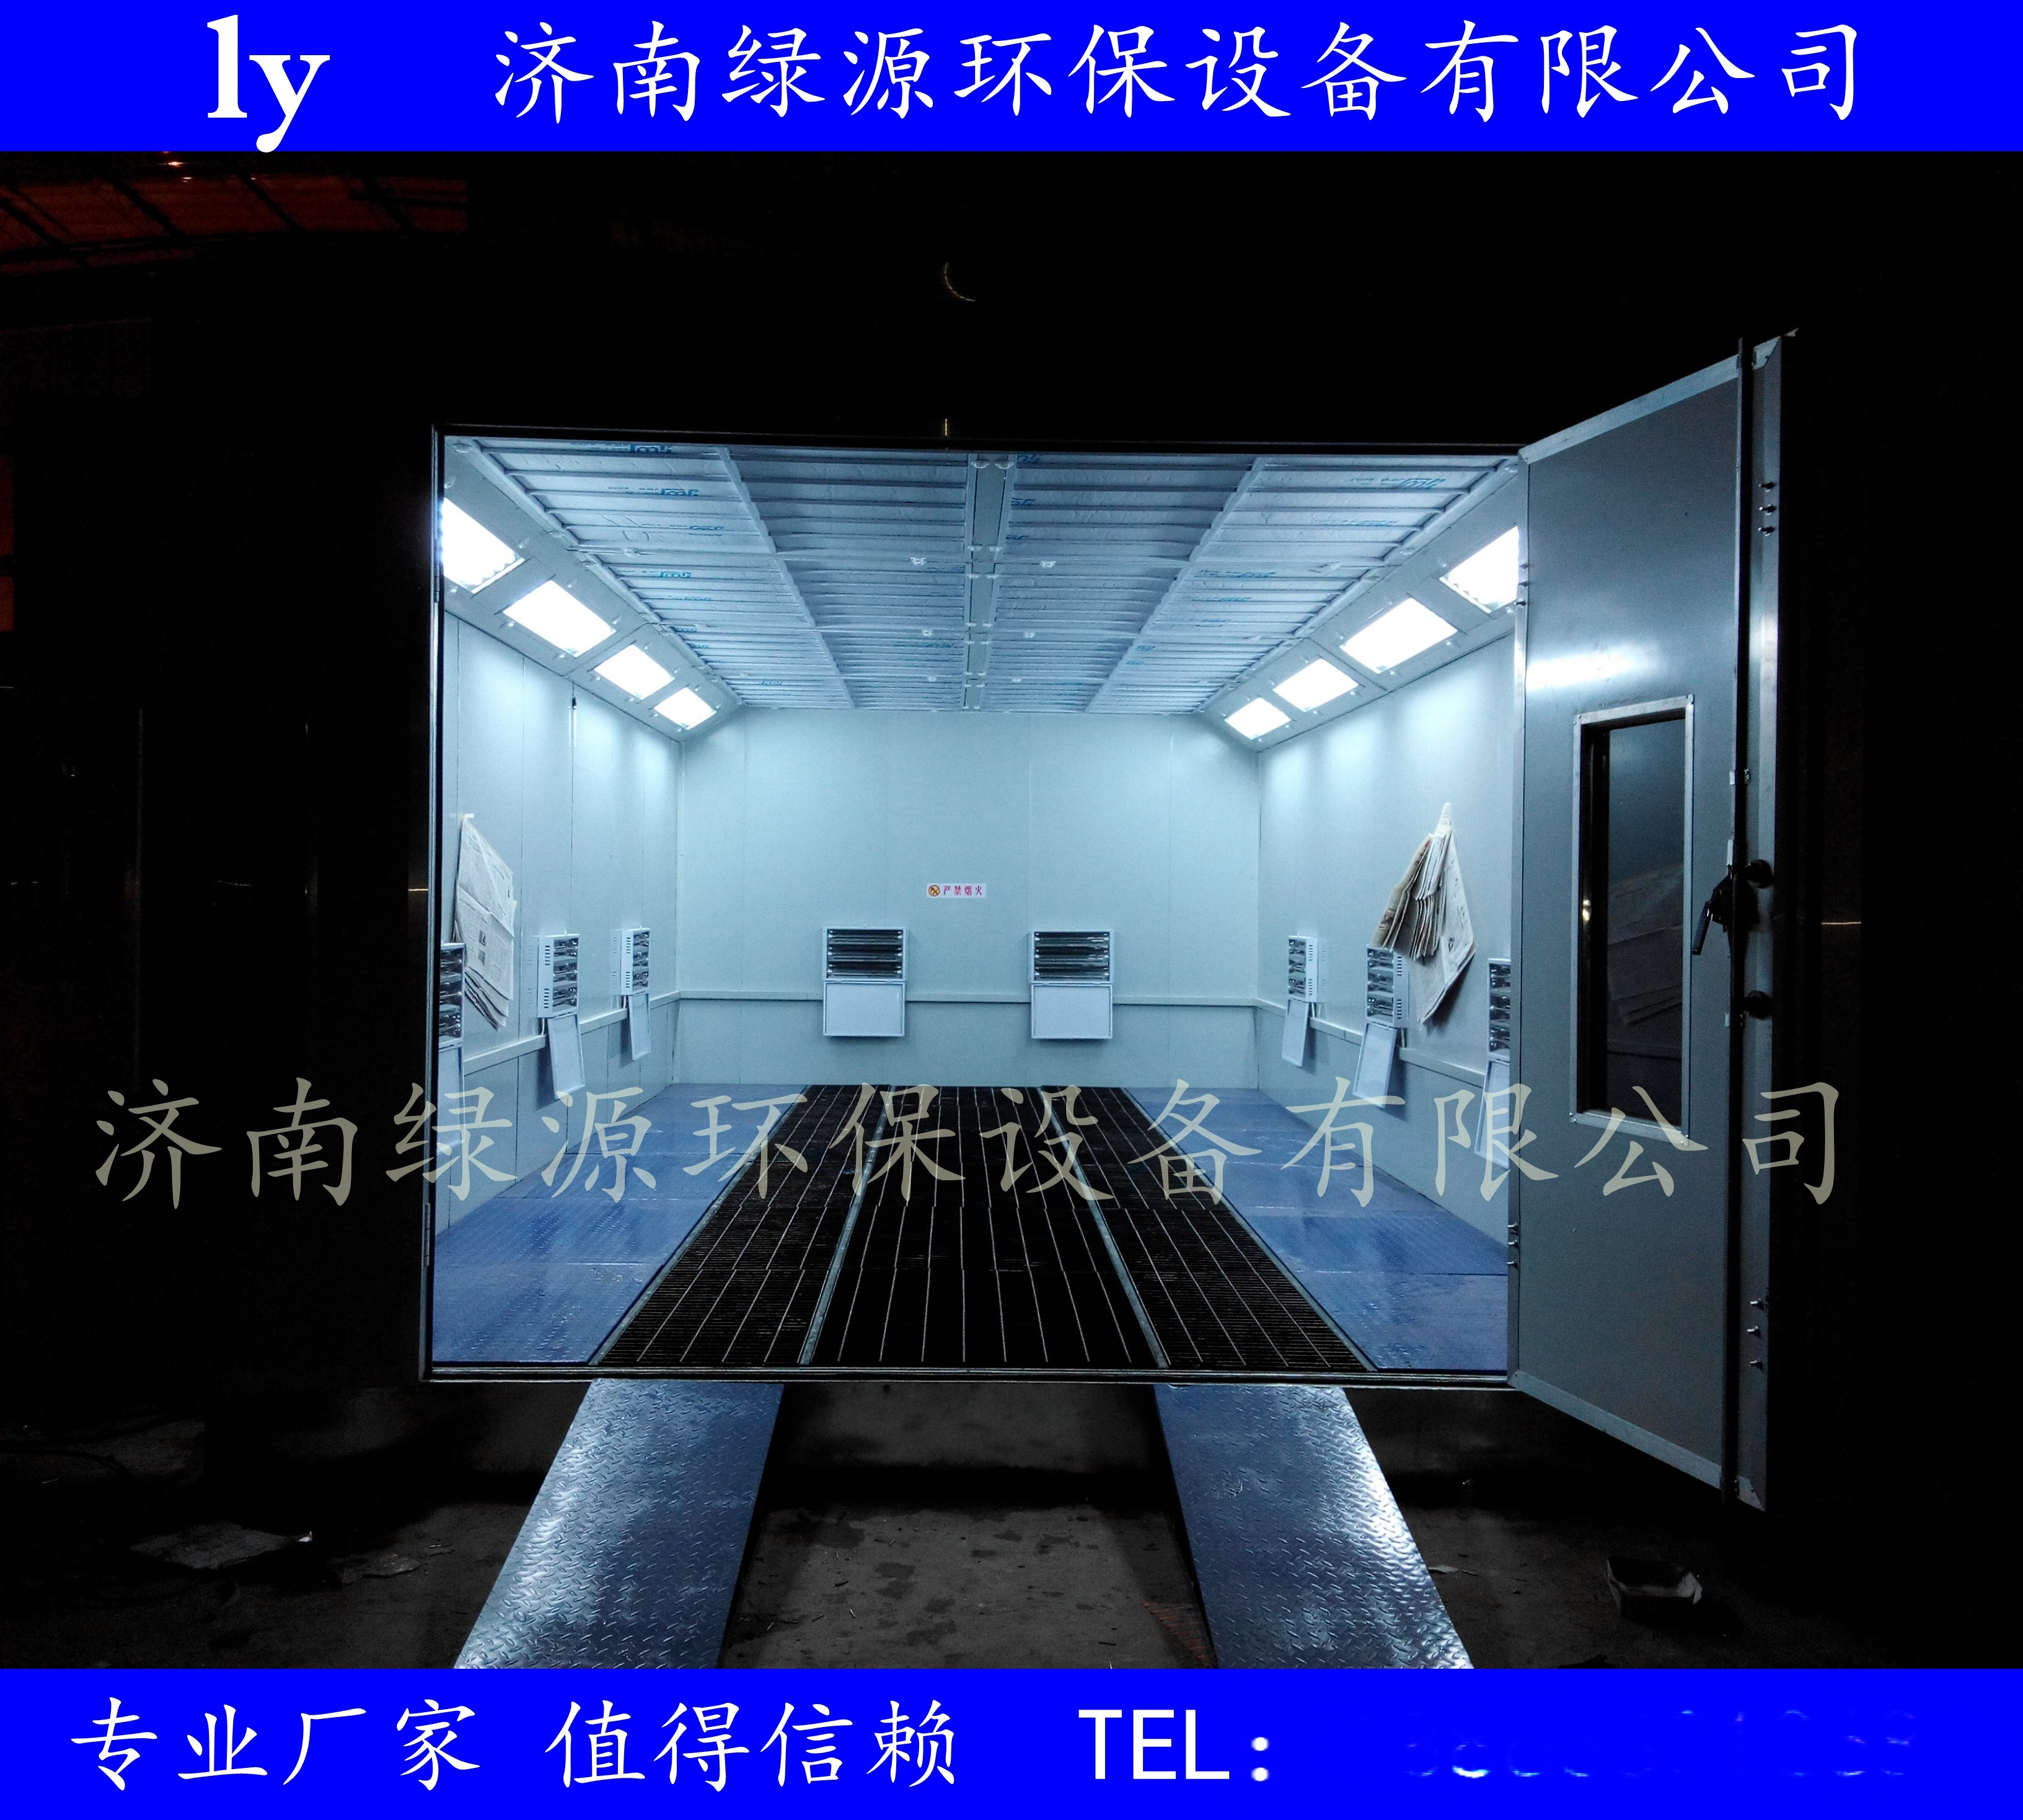 IMG_20141120_193843.jpg